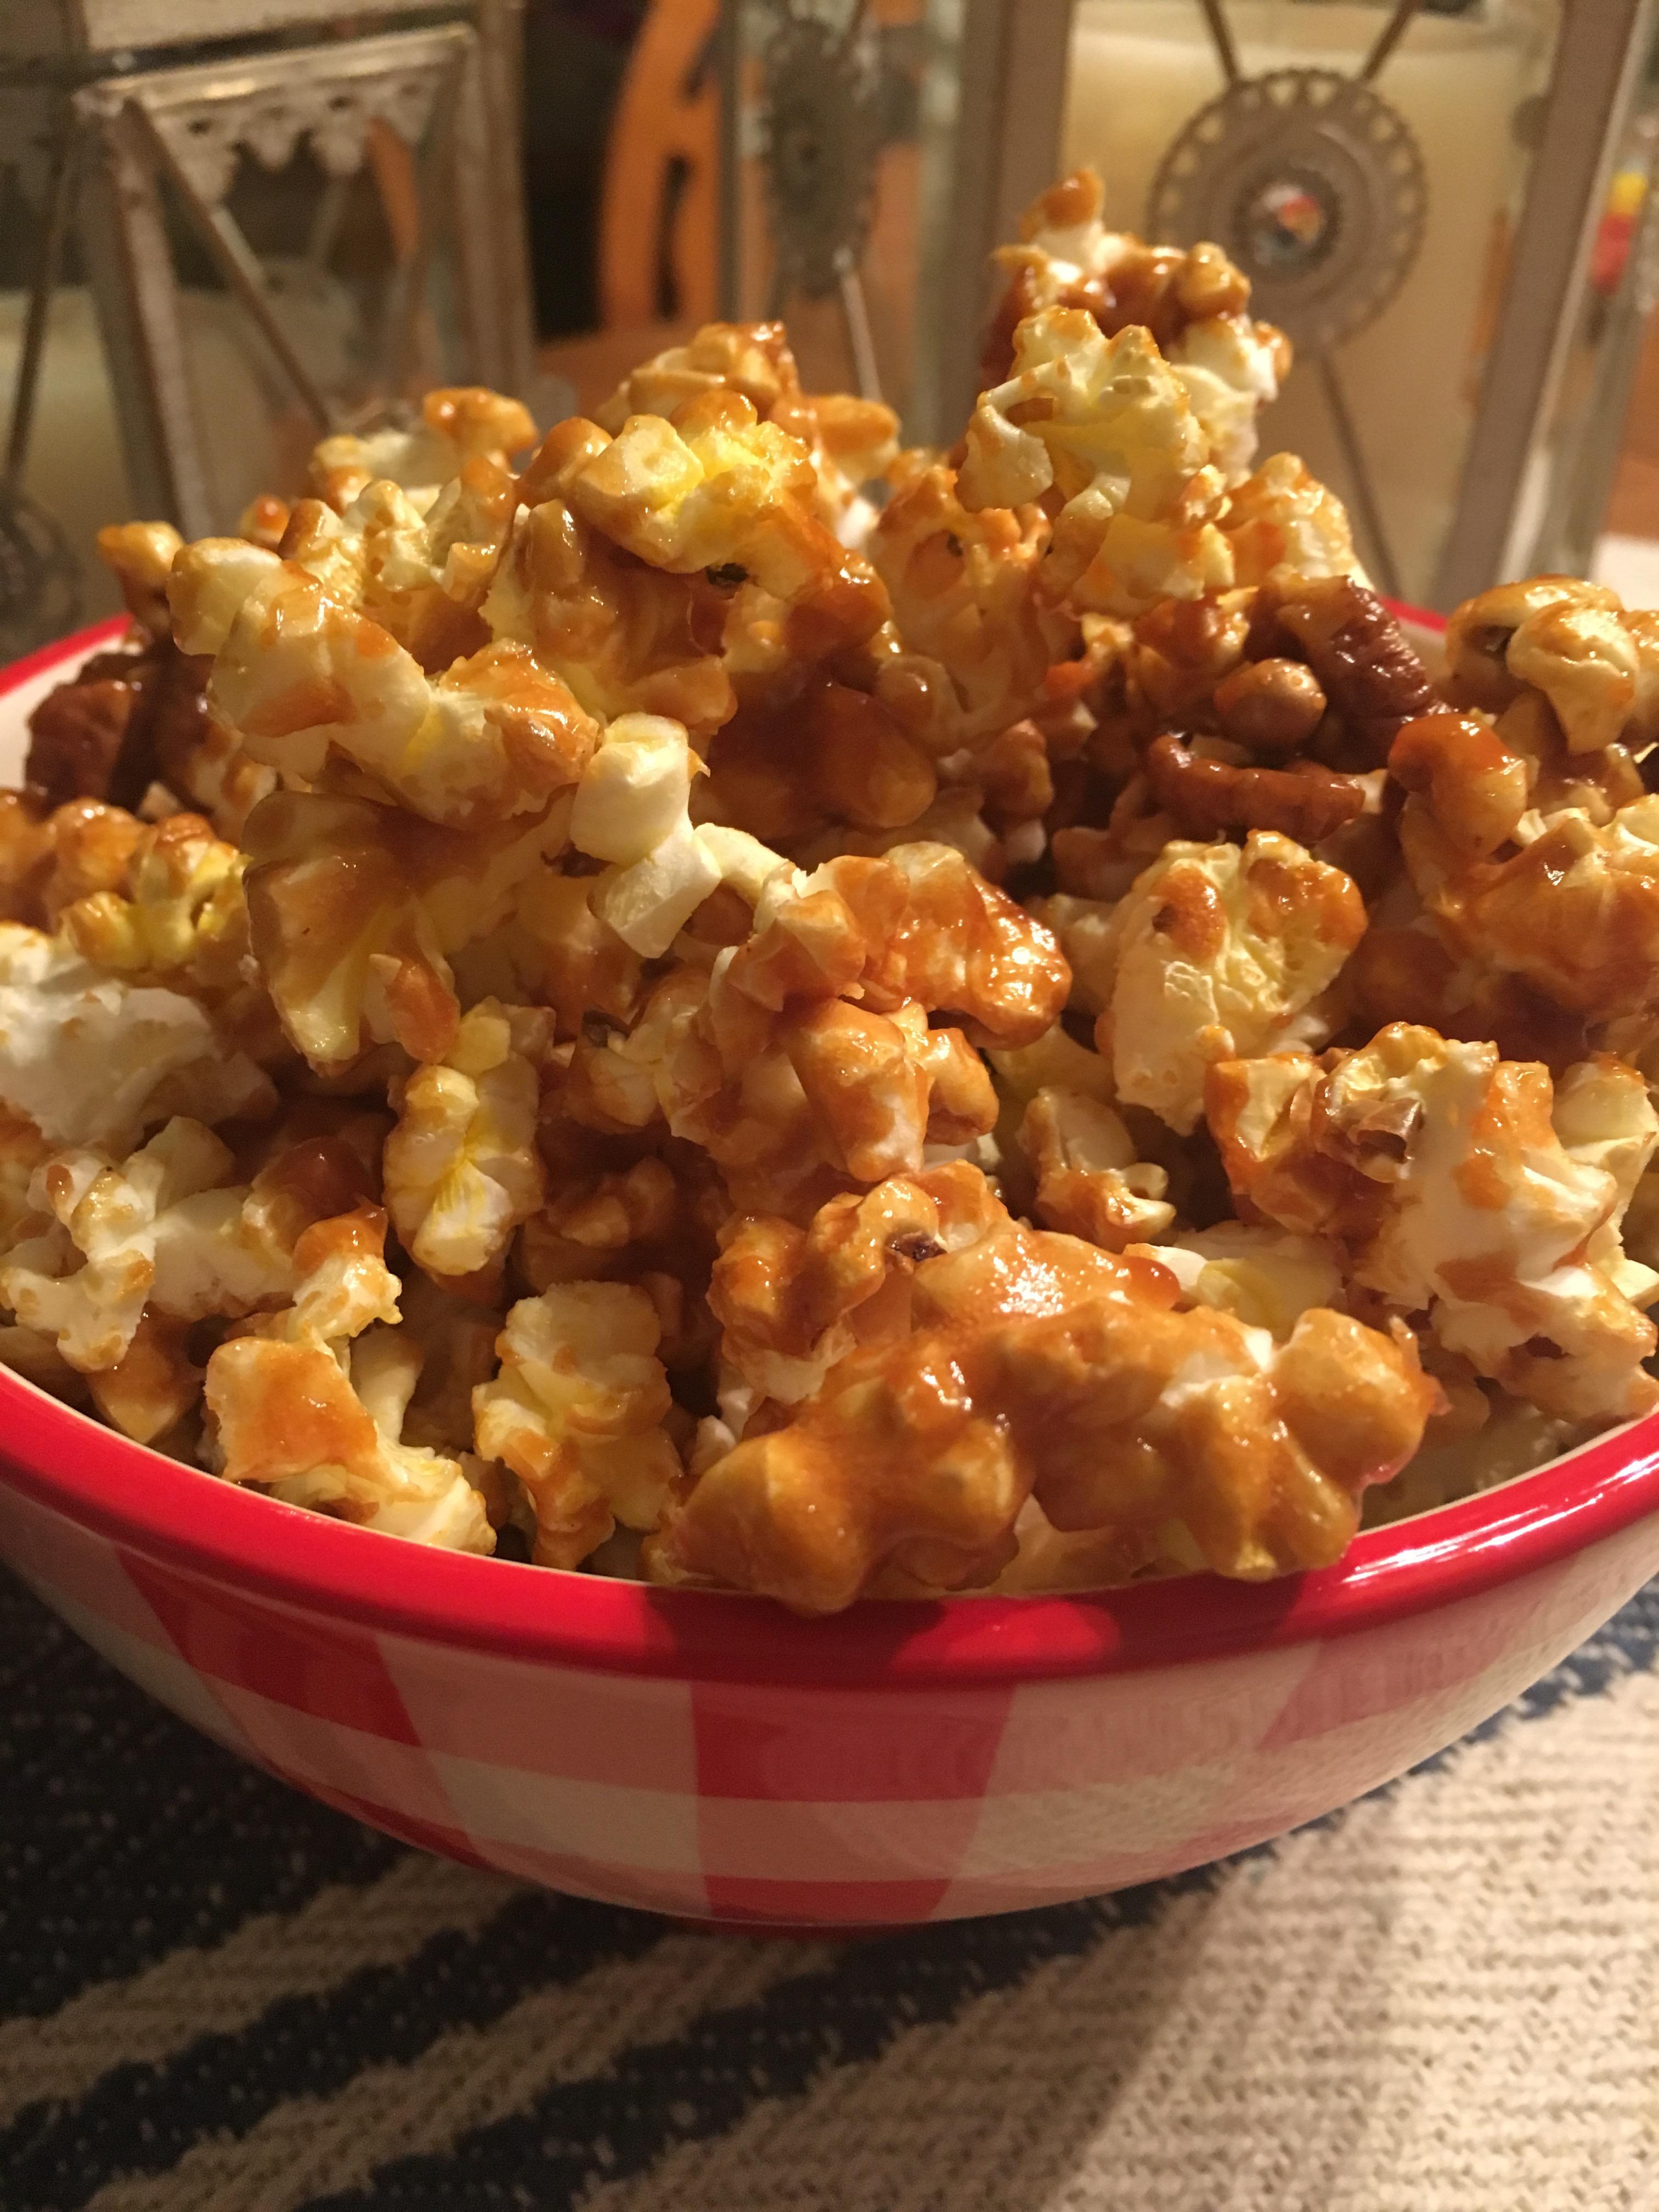 Picture of Gluten Free Maple Pecan Popcorn